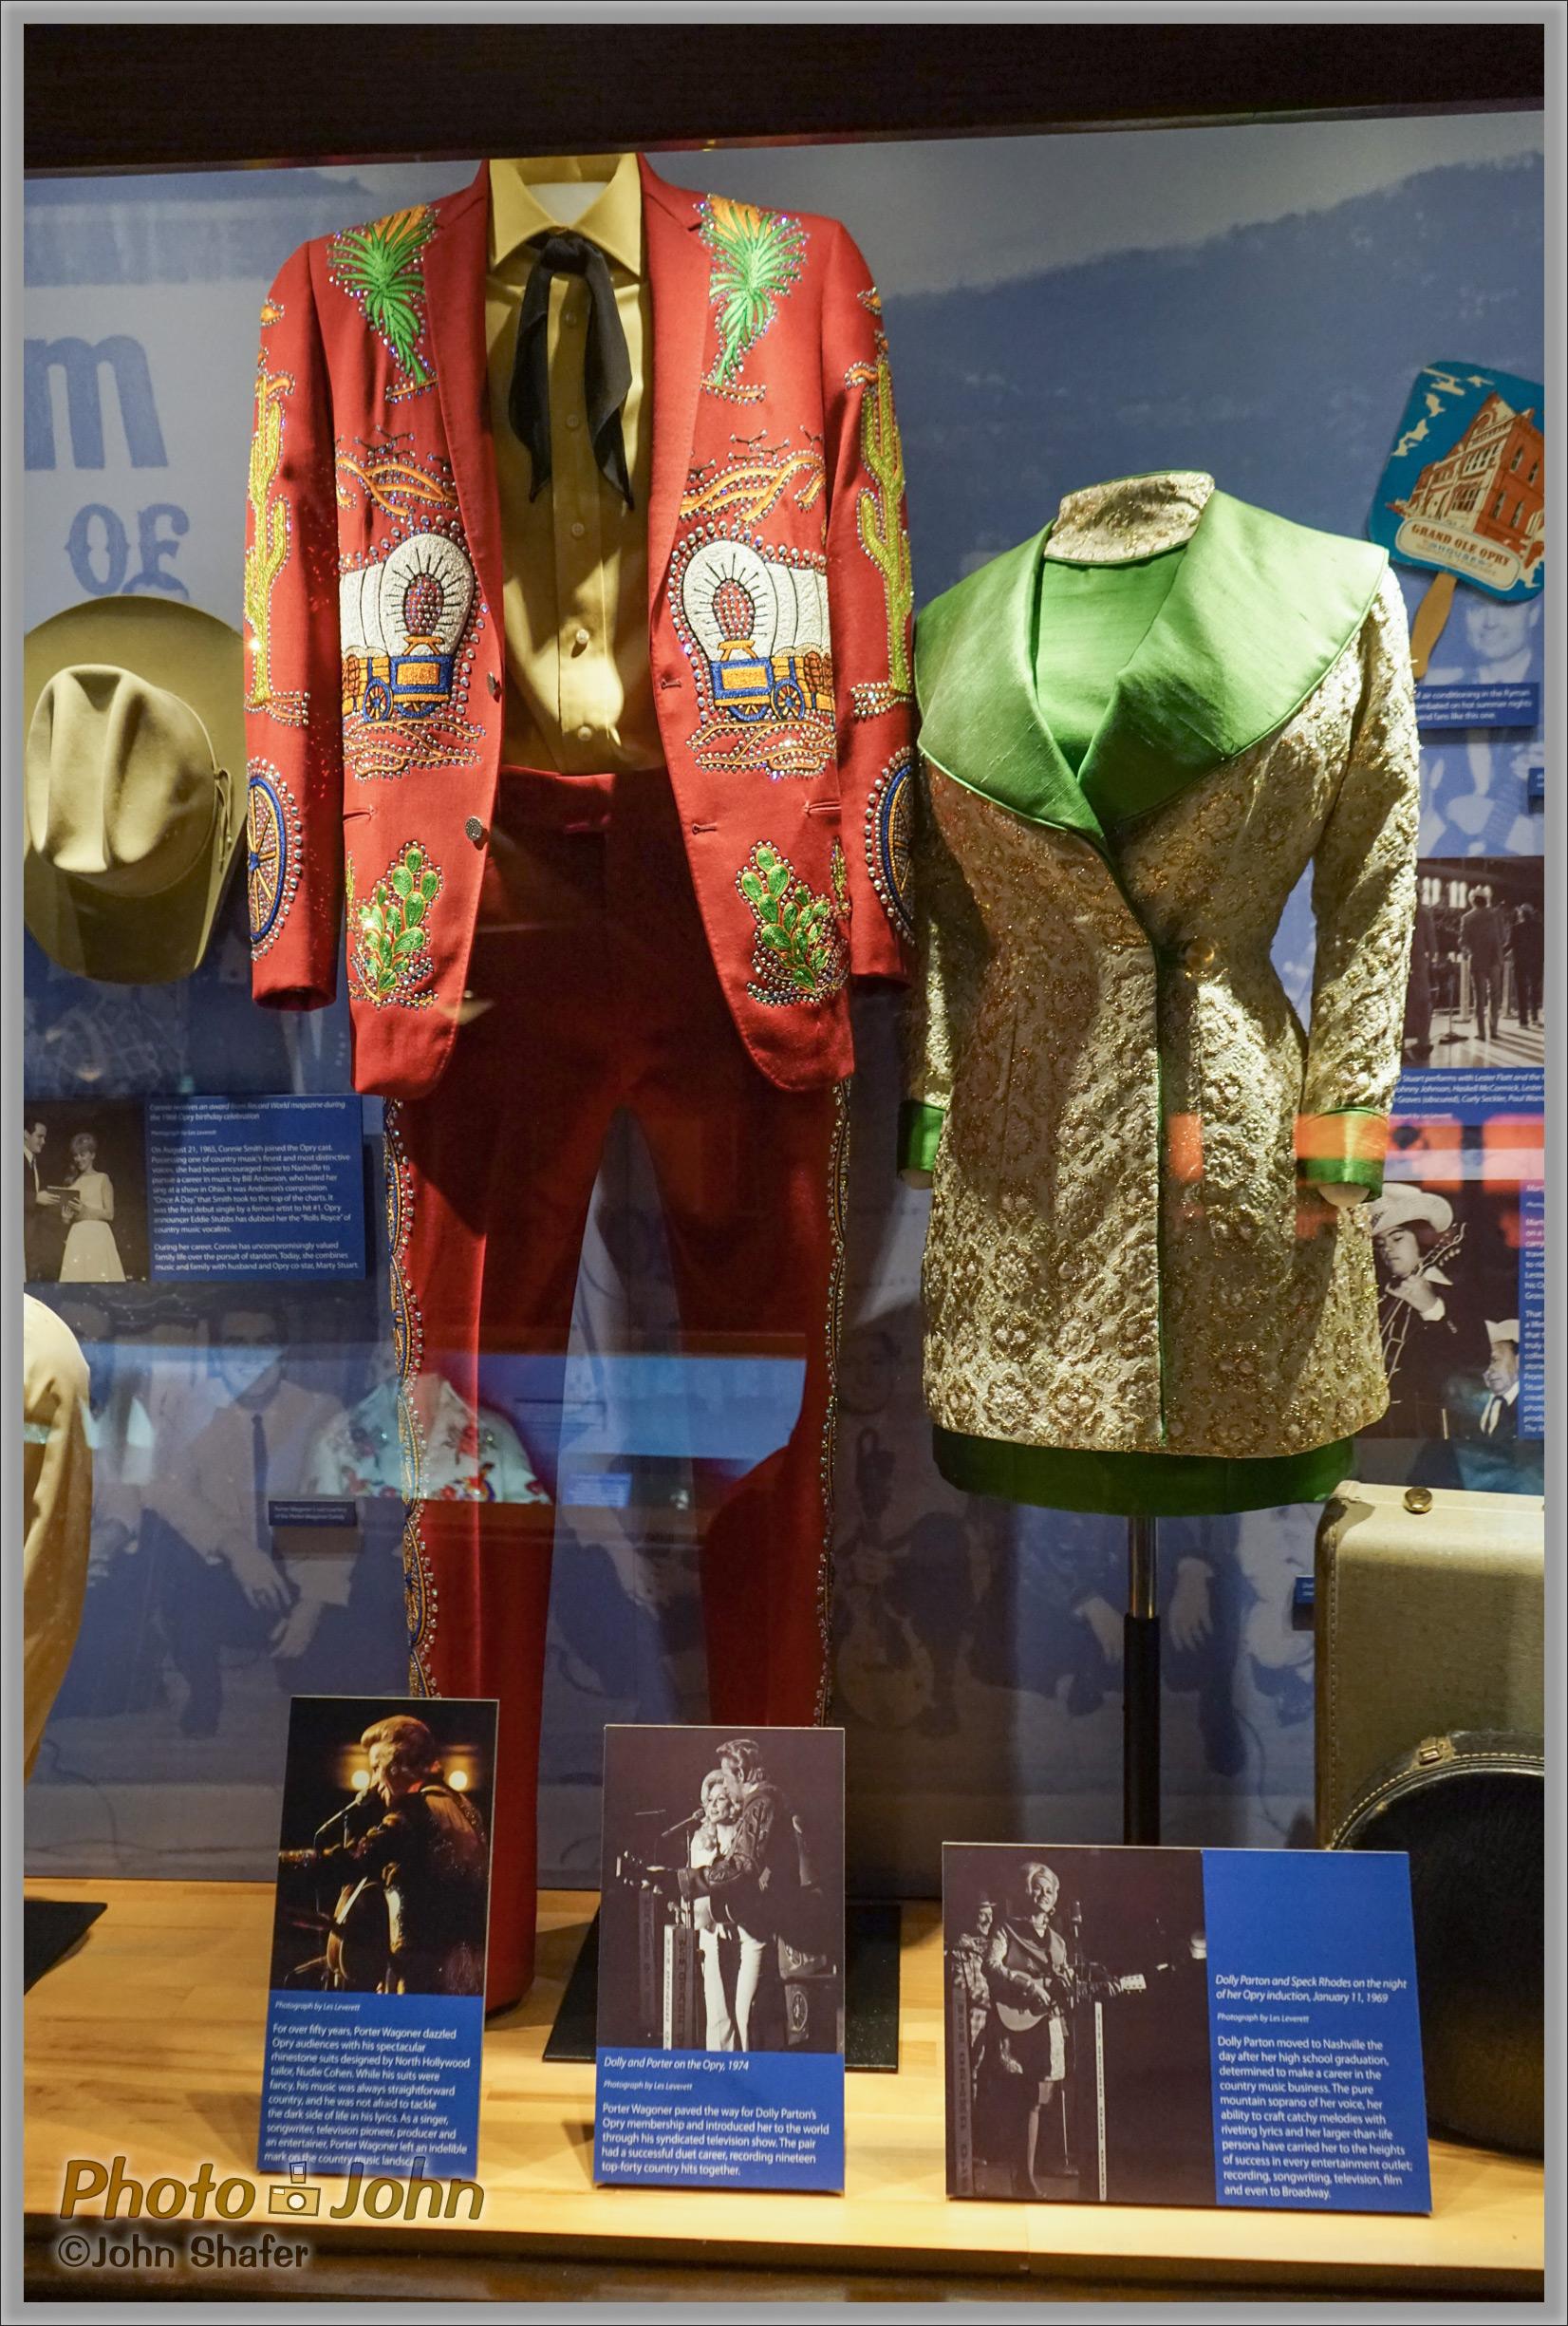 Sony Alpha A7R - Porter Wagoner & Dolly Parton's Clothes - Ryman Auditorium